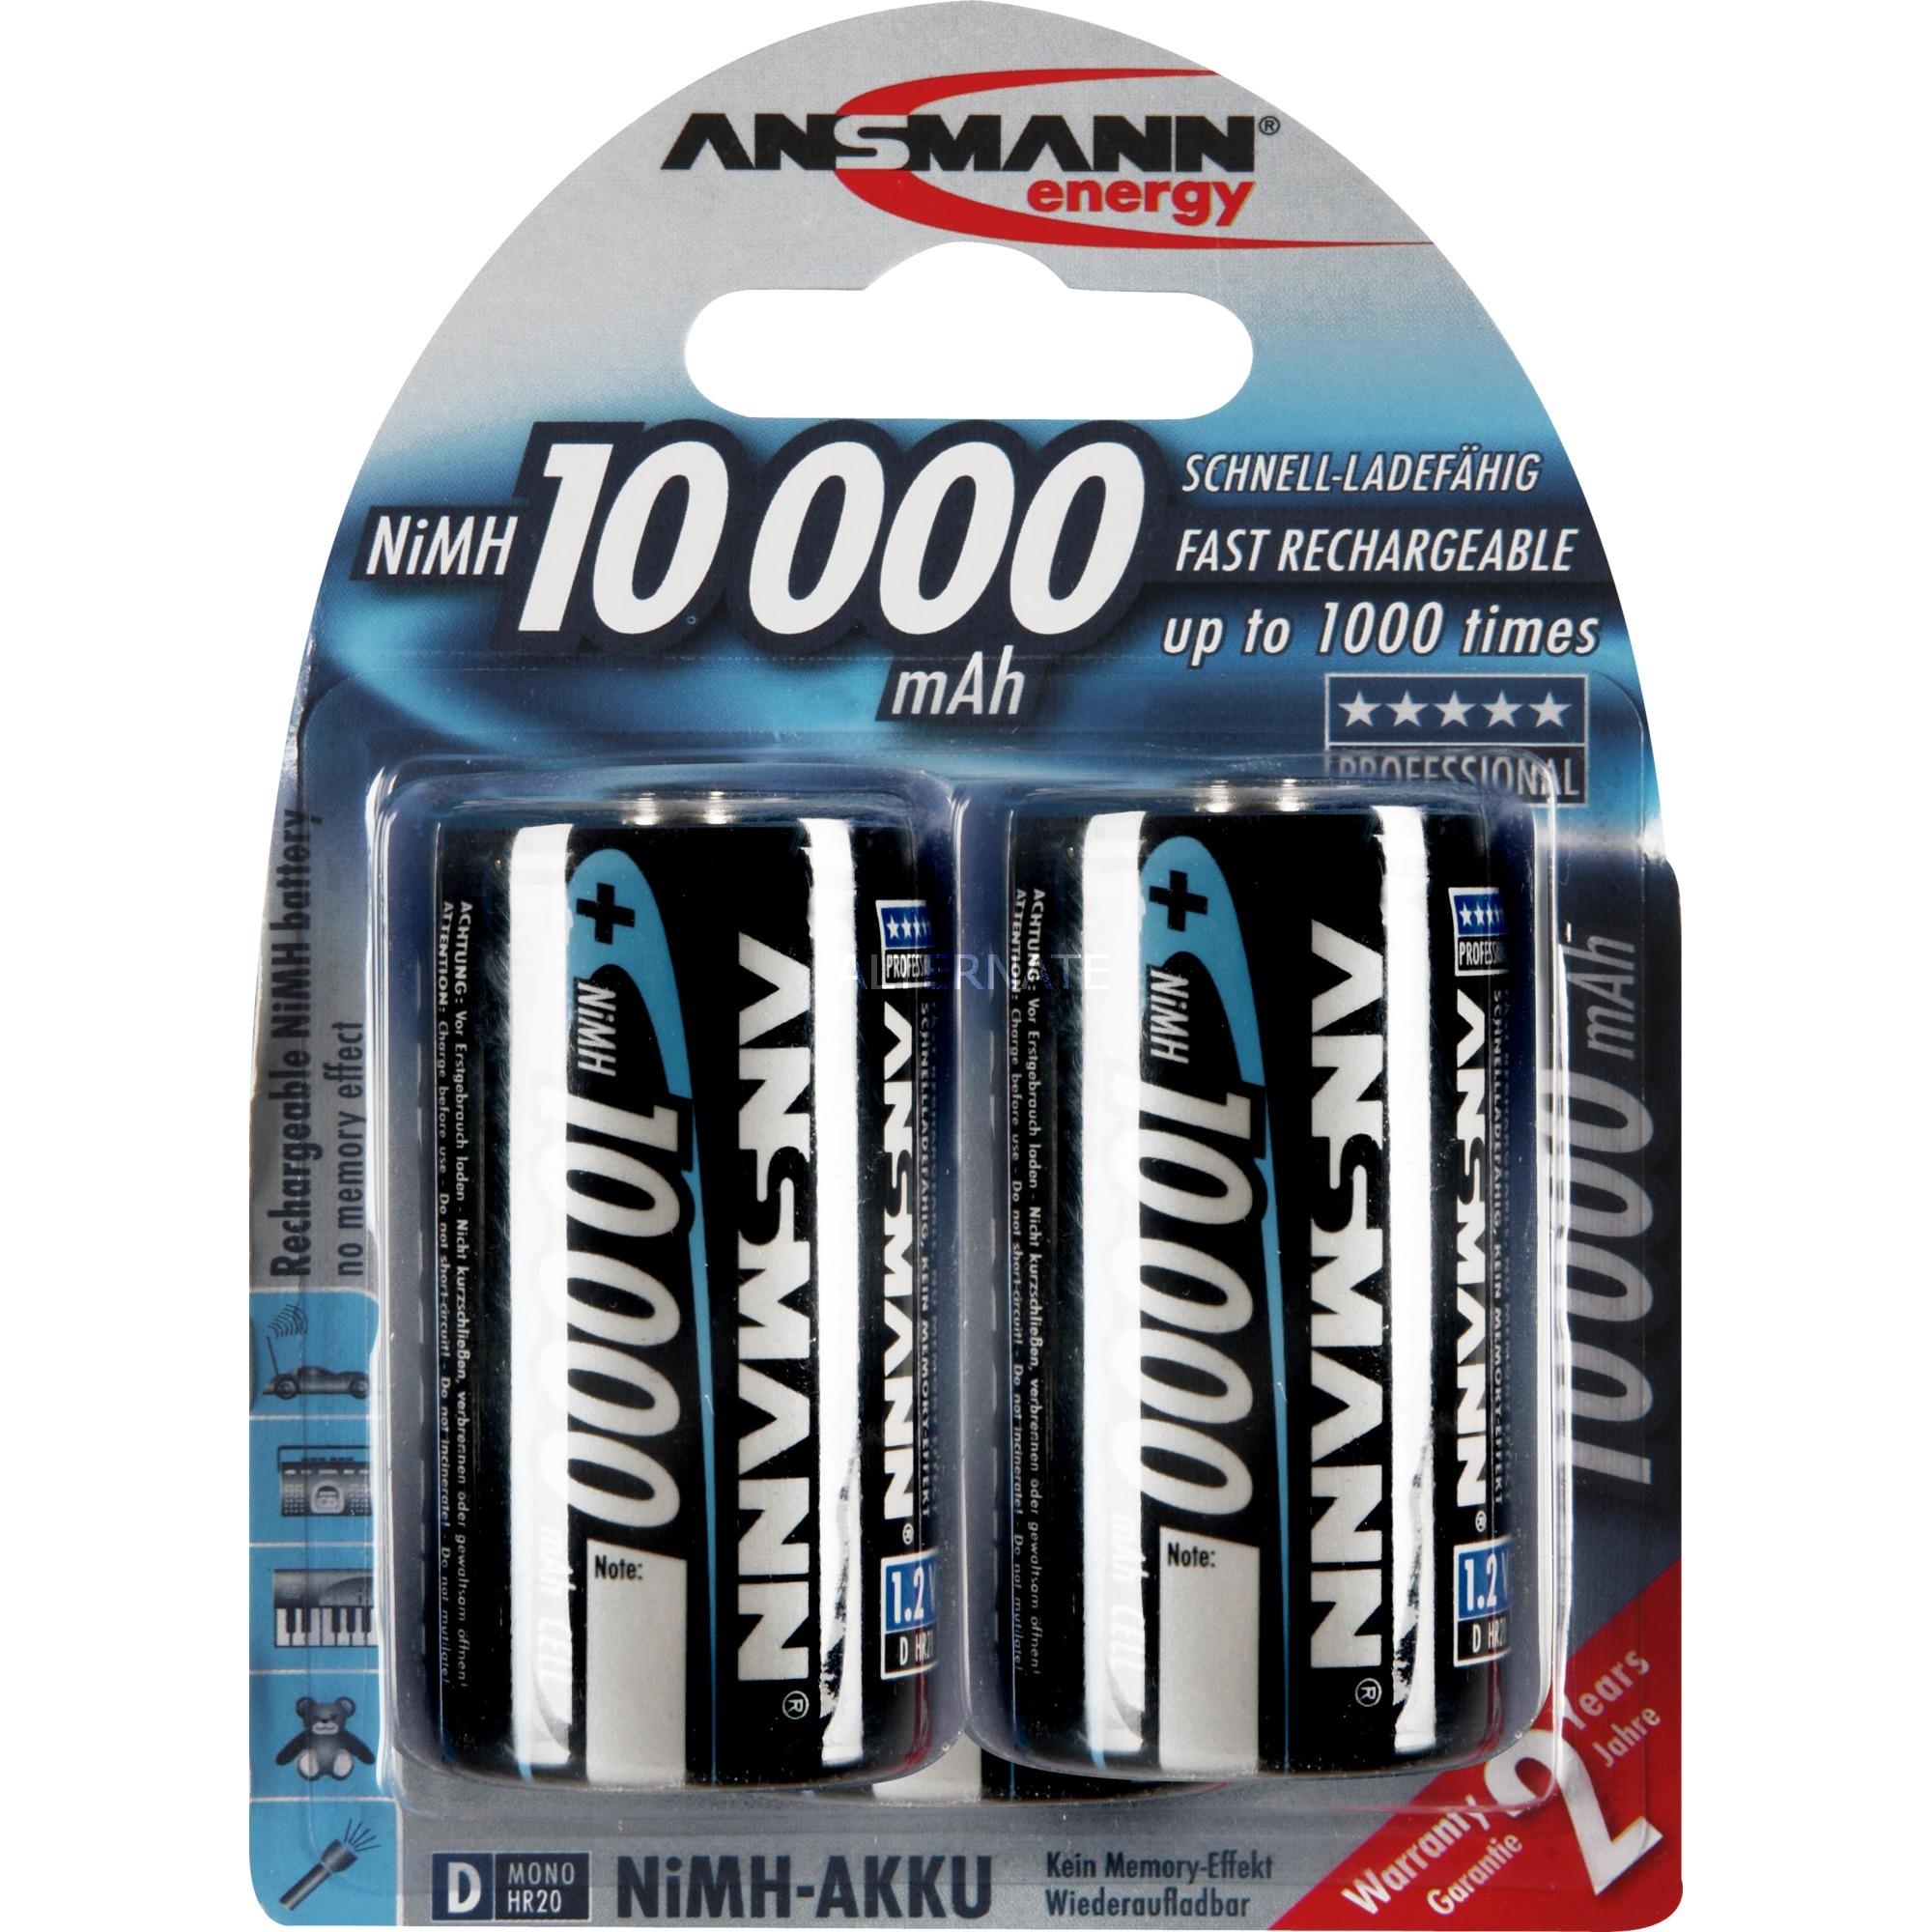 10000 mAh - Mono / D / HR20 Níquel-metal hidruro (NiMH) 10000mAh 1.2V batería recargable